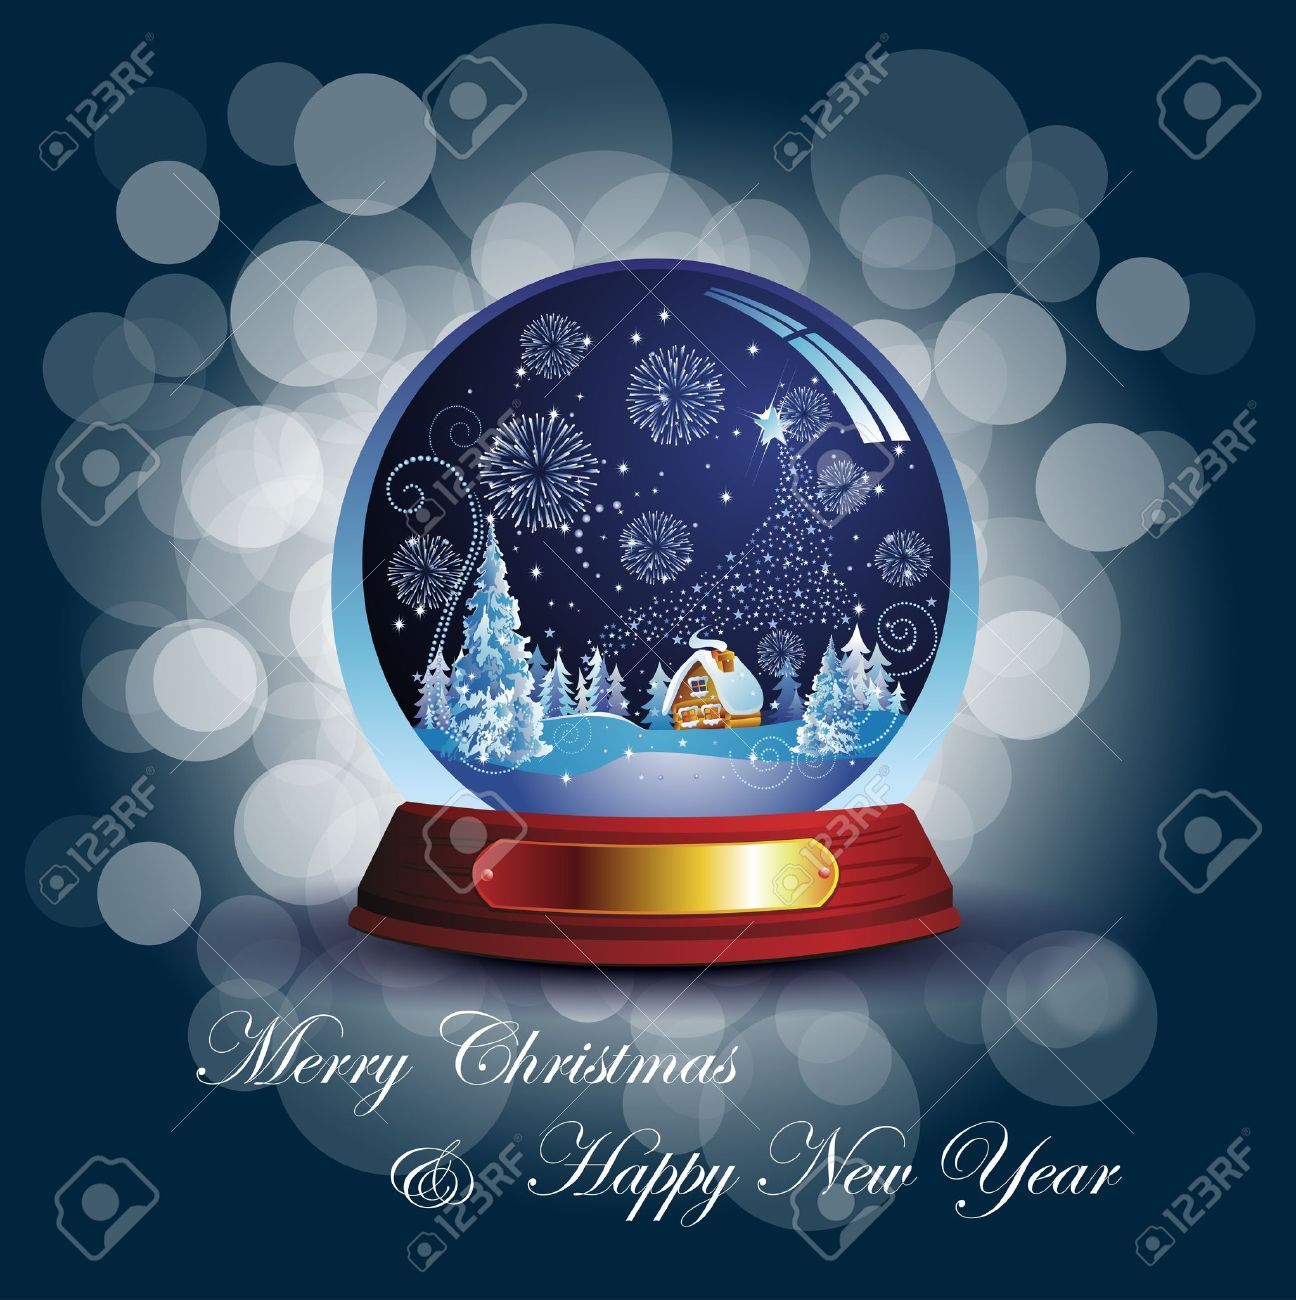 Christmas card with snow globe Stock Vector - 16185849